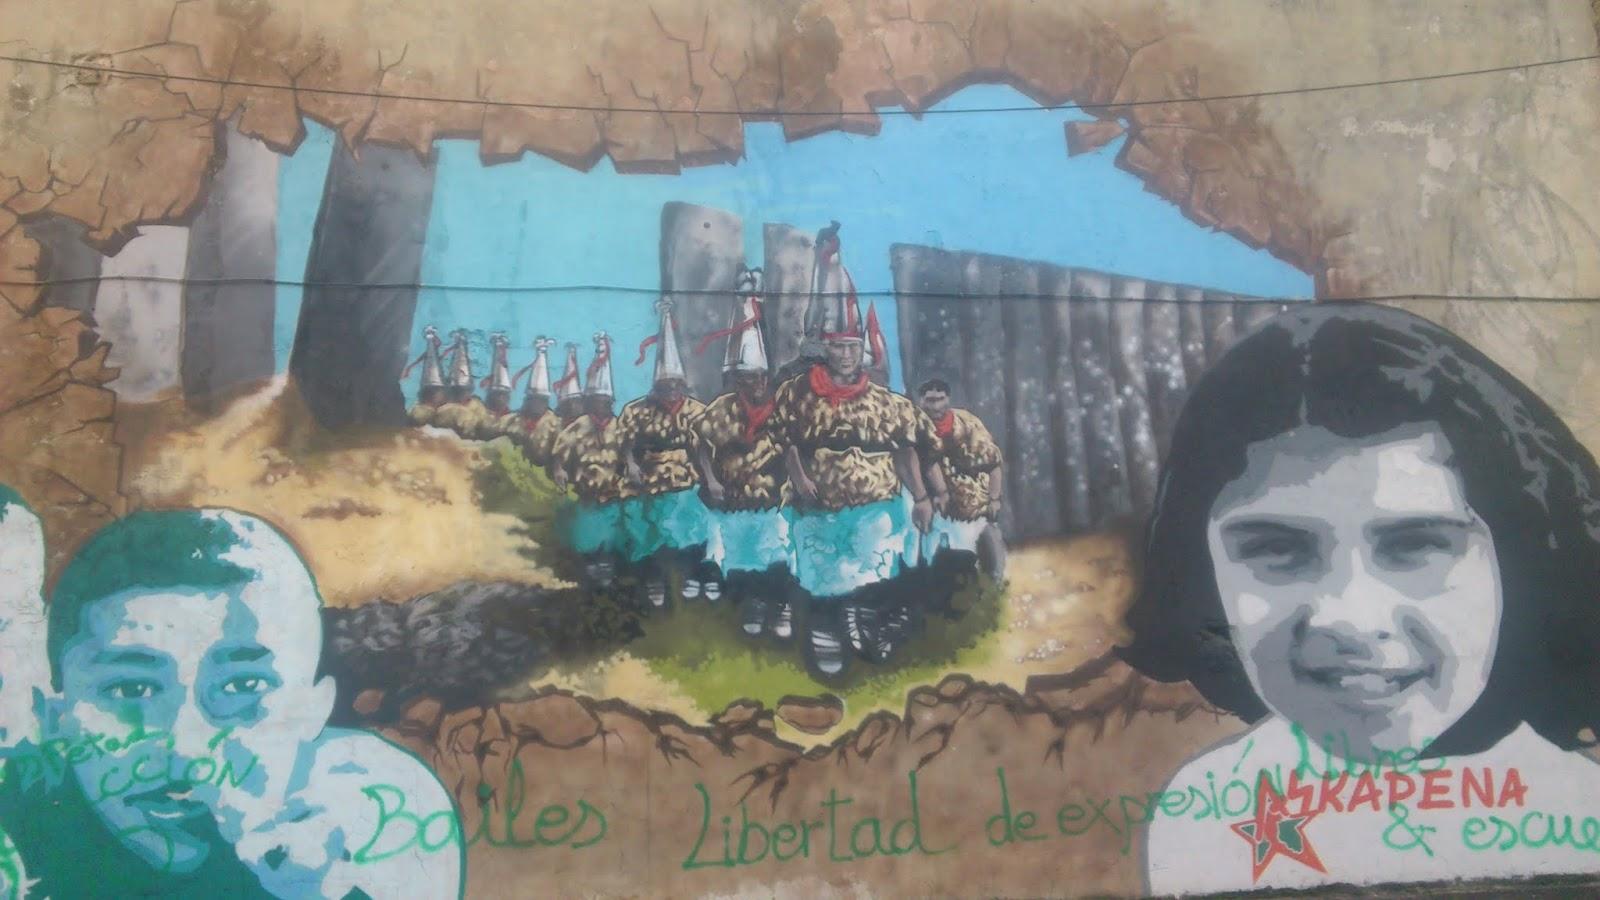 Mural de Vitoria Gasteiz de cerca